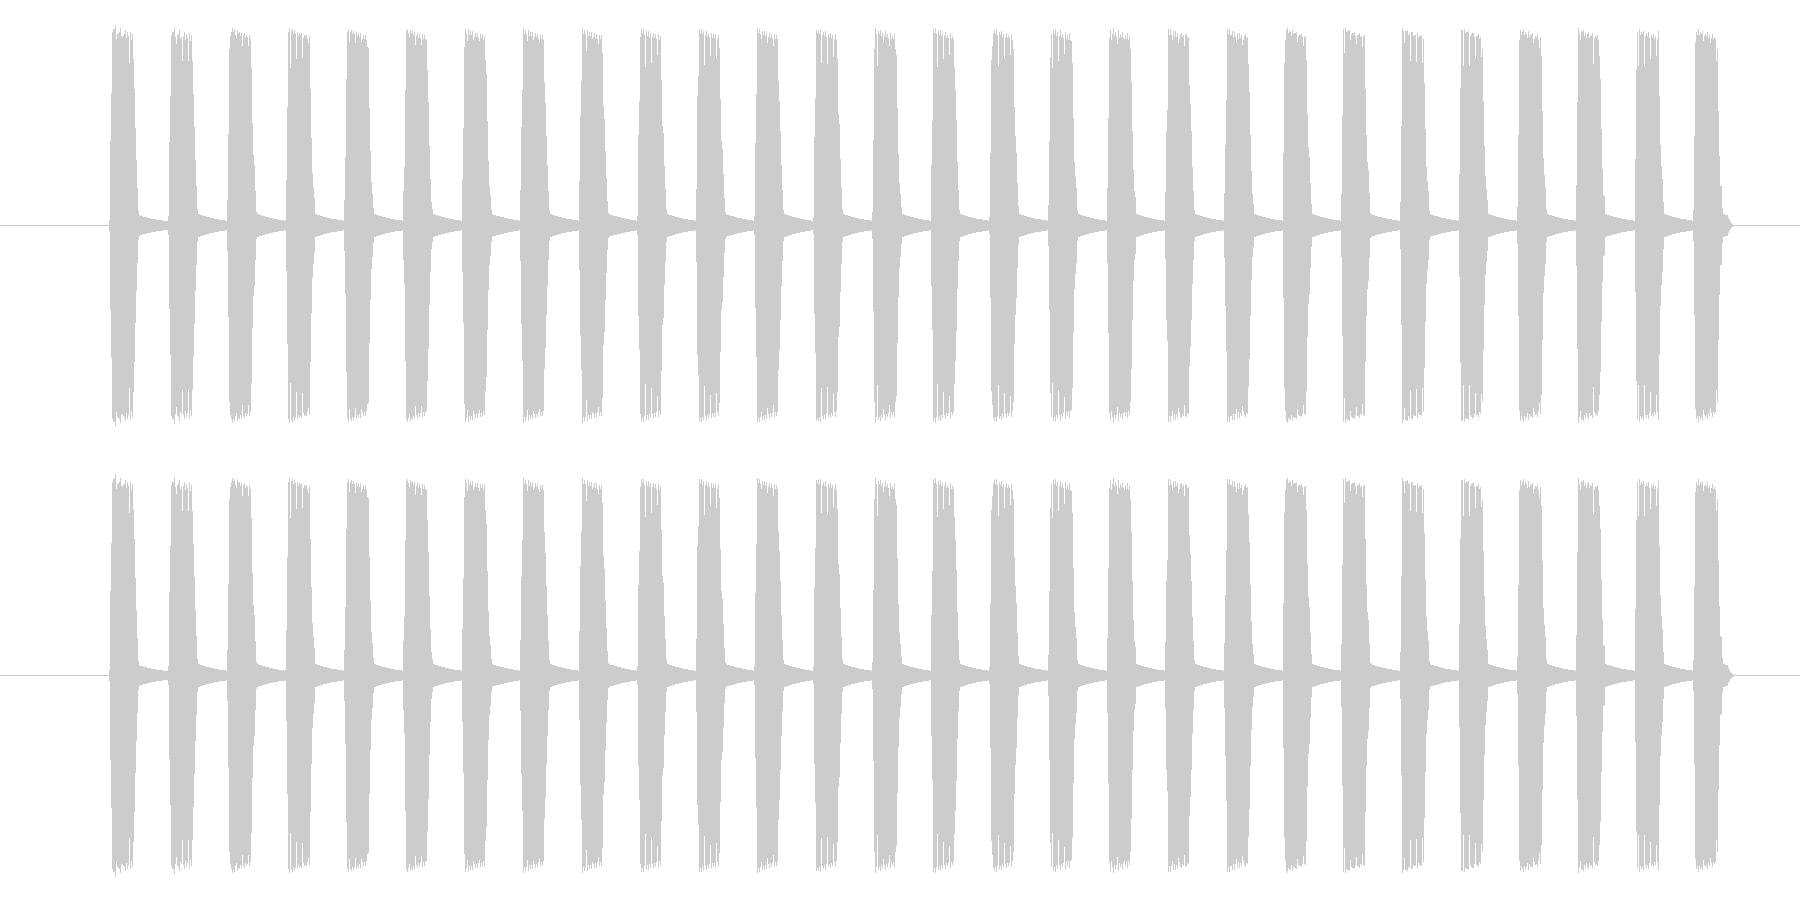 SNES シューティング02-16(スコの未再生の波形